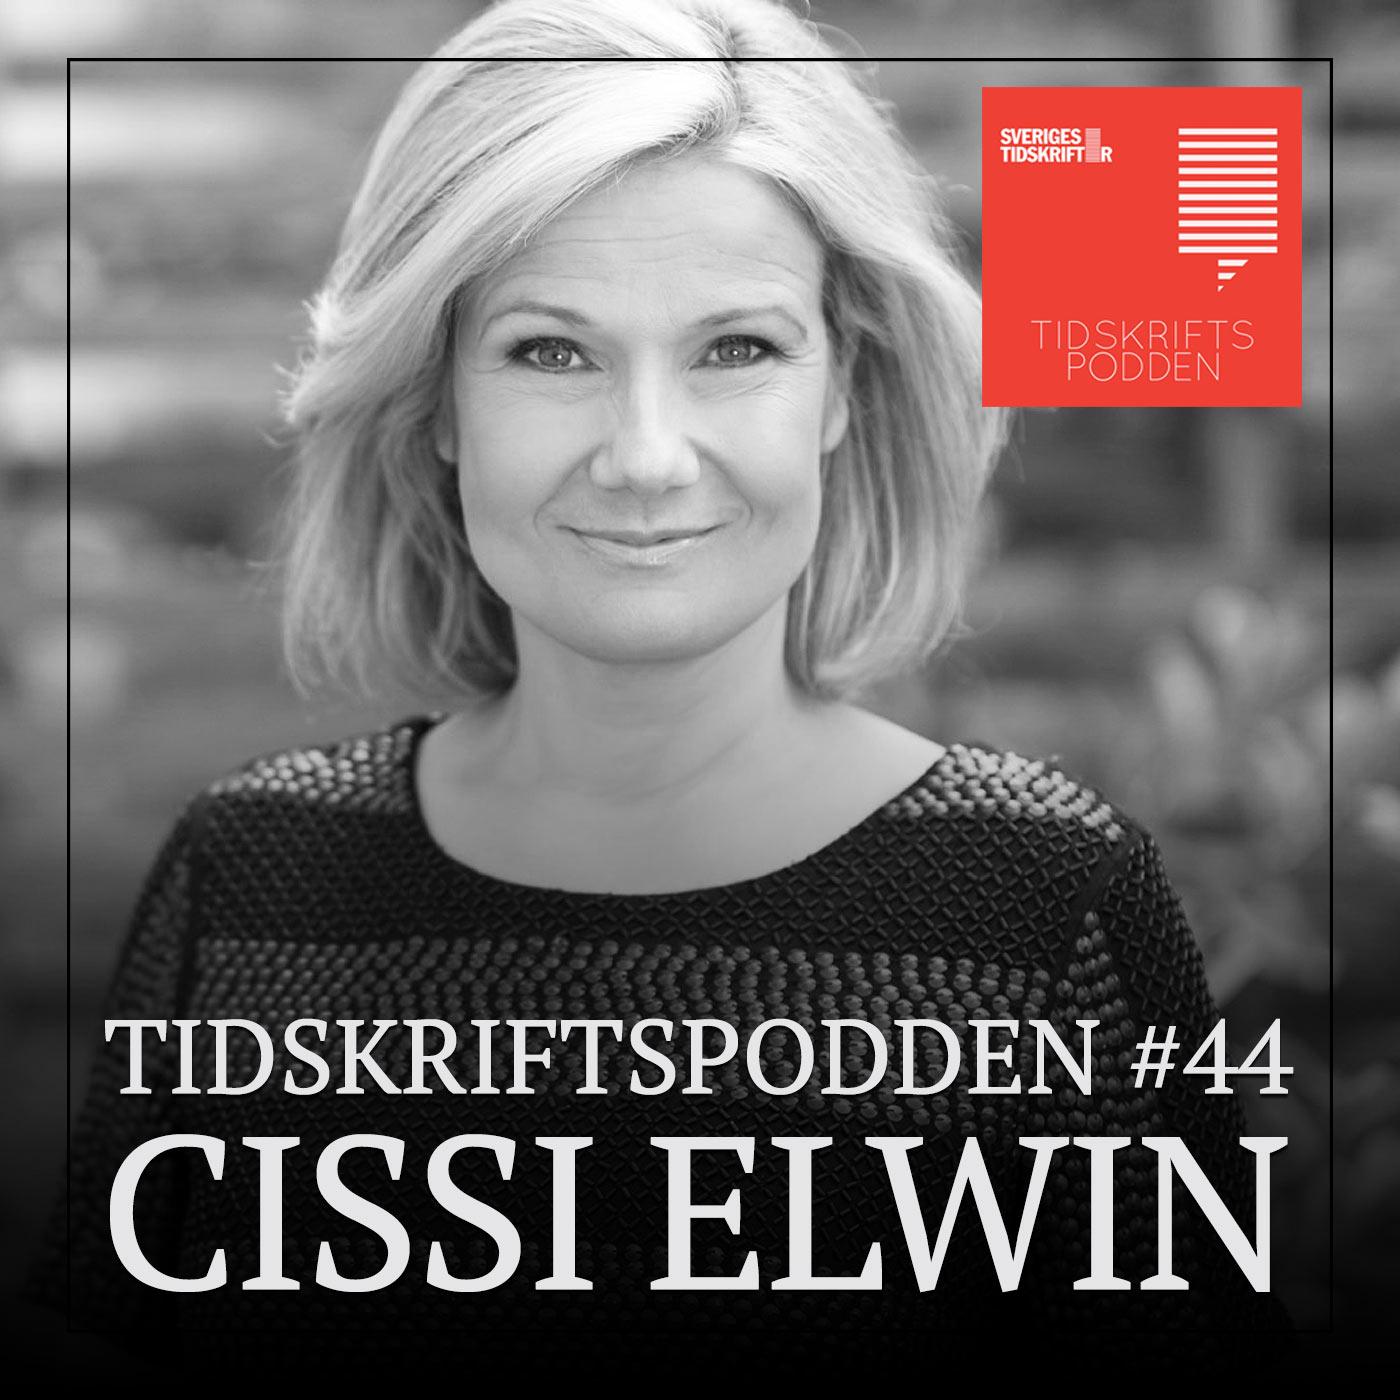 Cissi Elwin, Tidskriftspodden